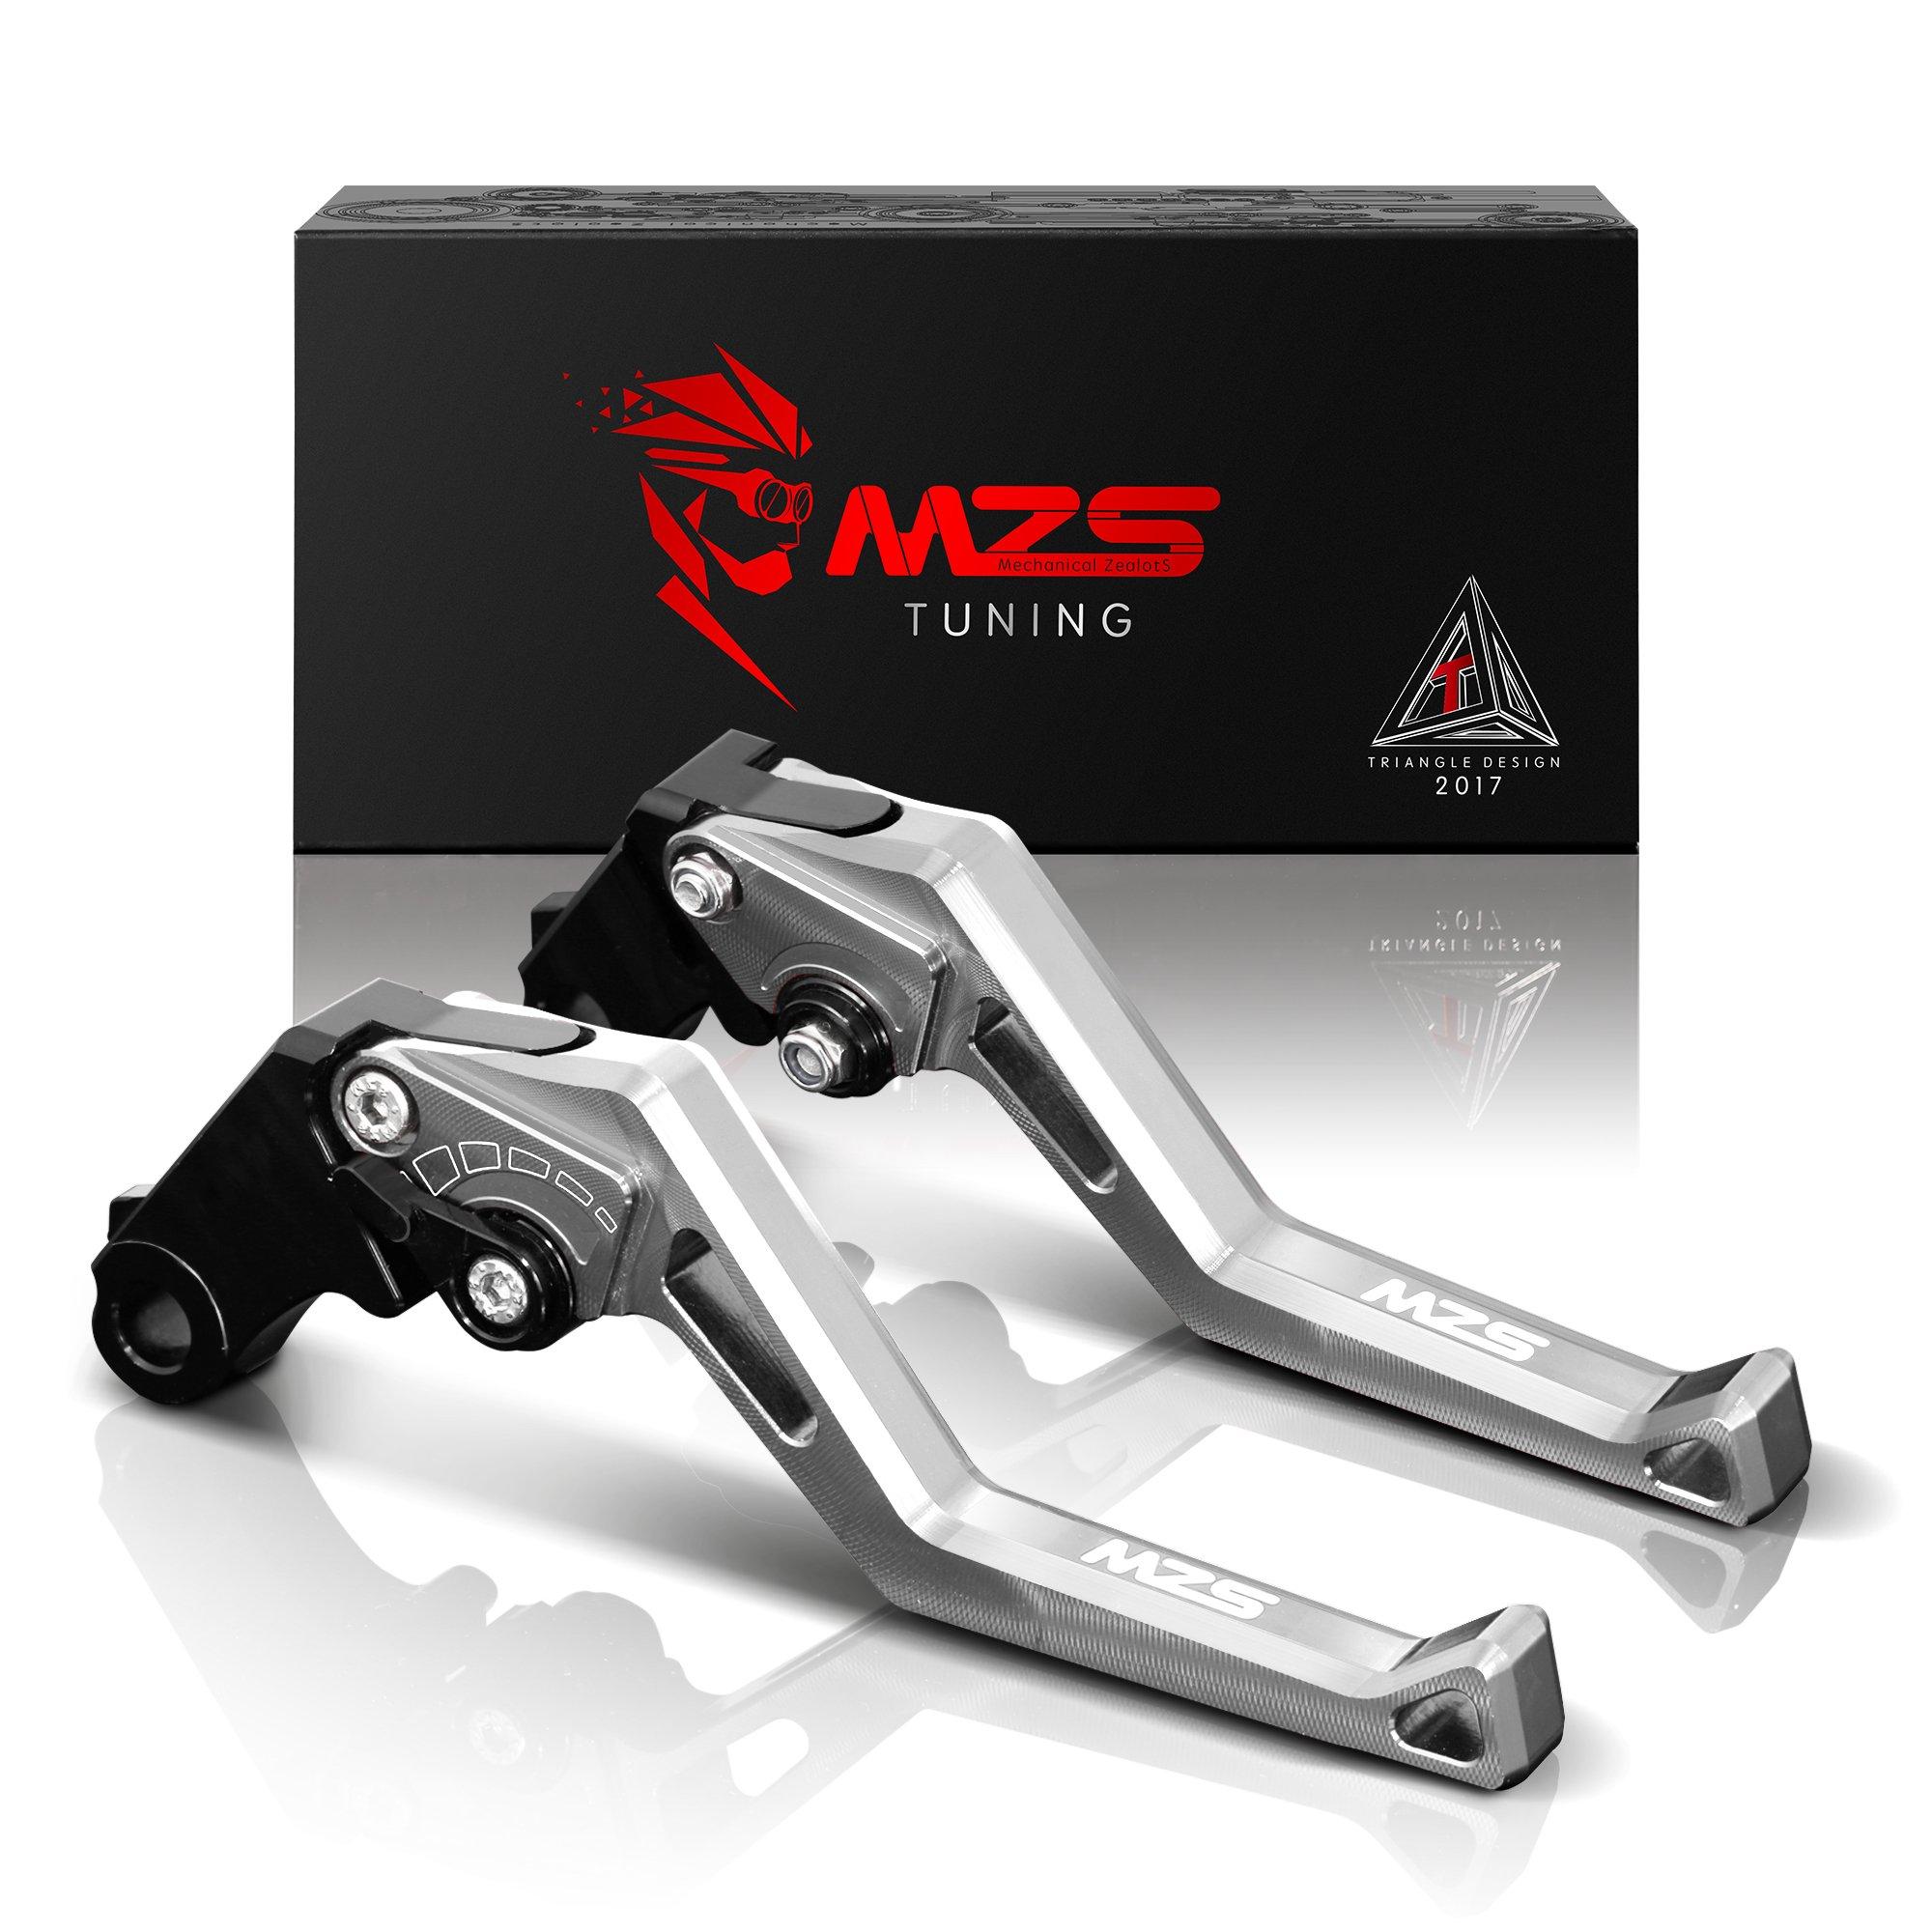 MZS Short Levers Adjustment Brake Clutch CNC for Yamaha YZF R6 YZF-R6 2005-2016/ YZF R1 YZF-R1 2004-2008 Silver by MZS